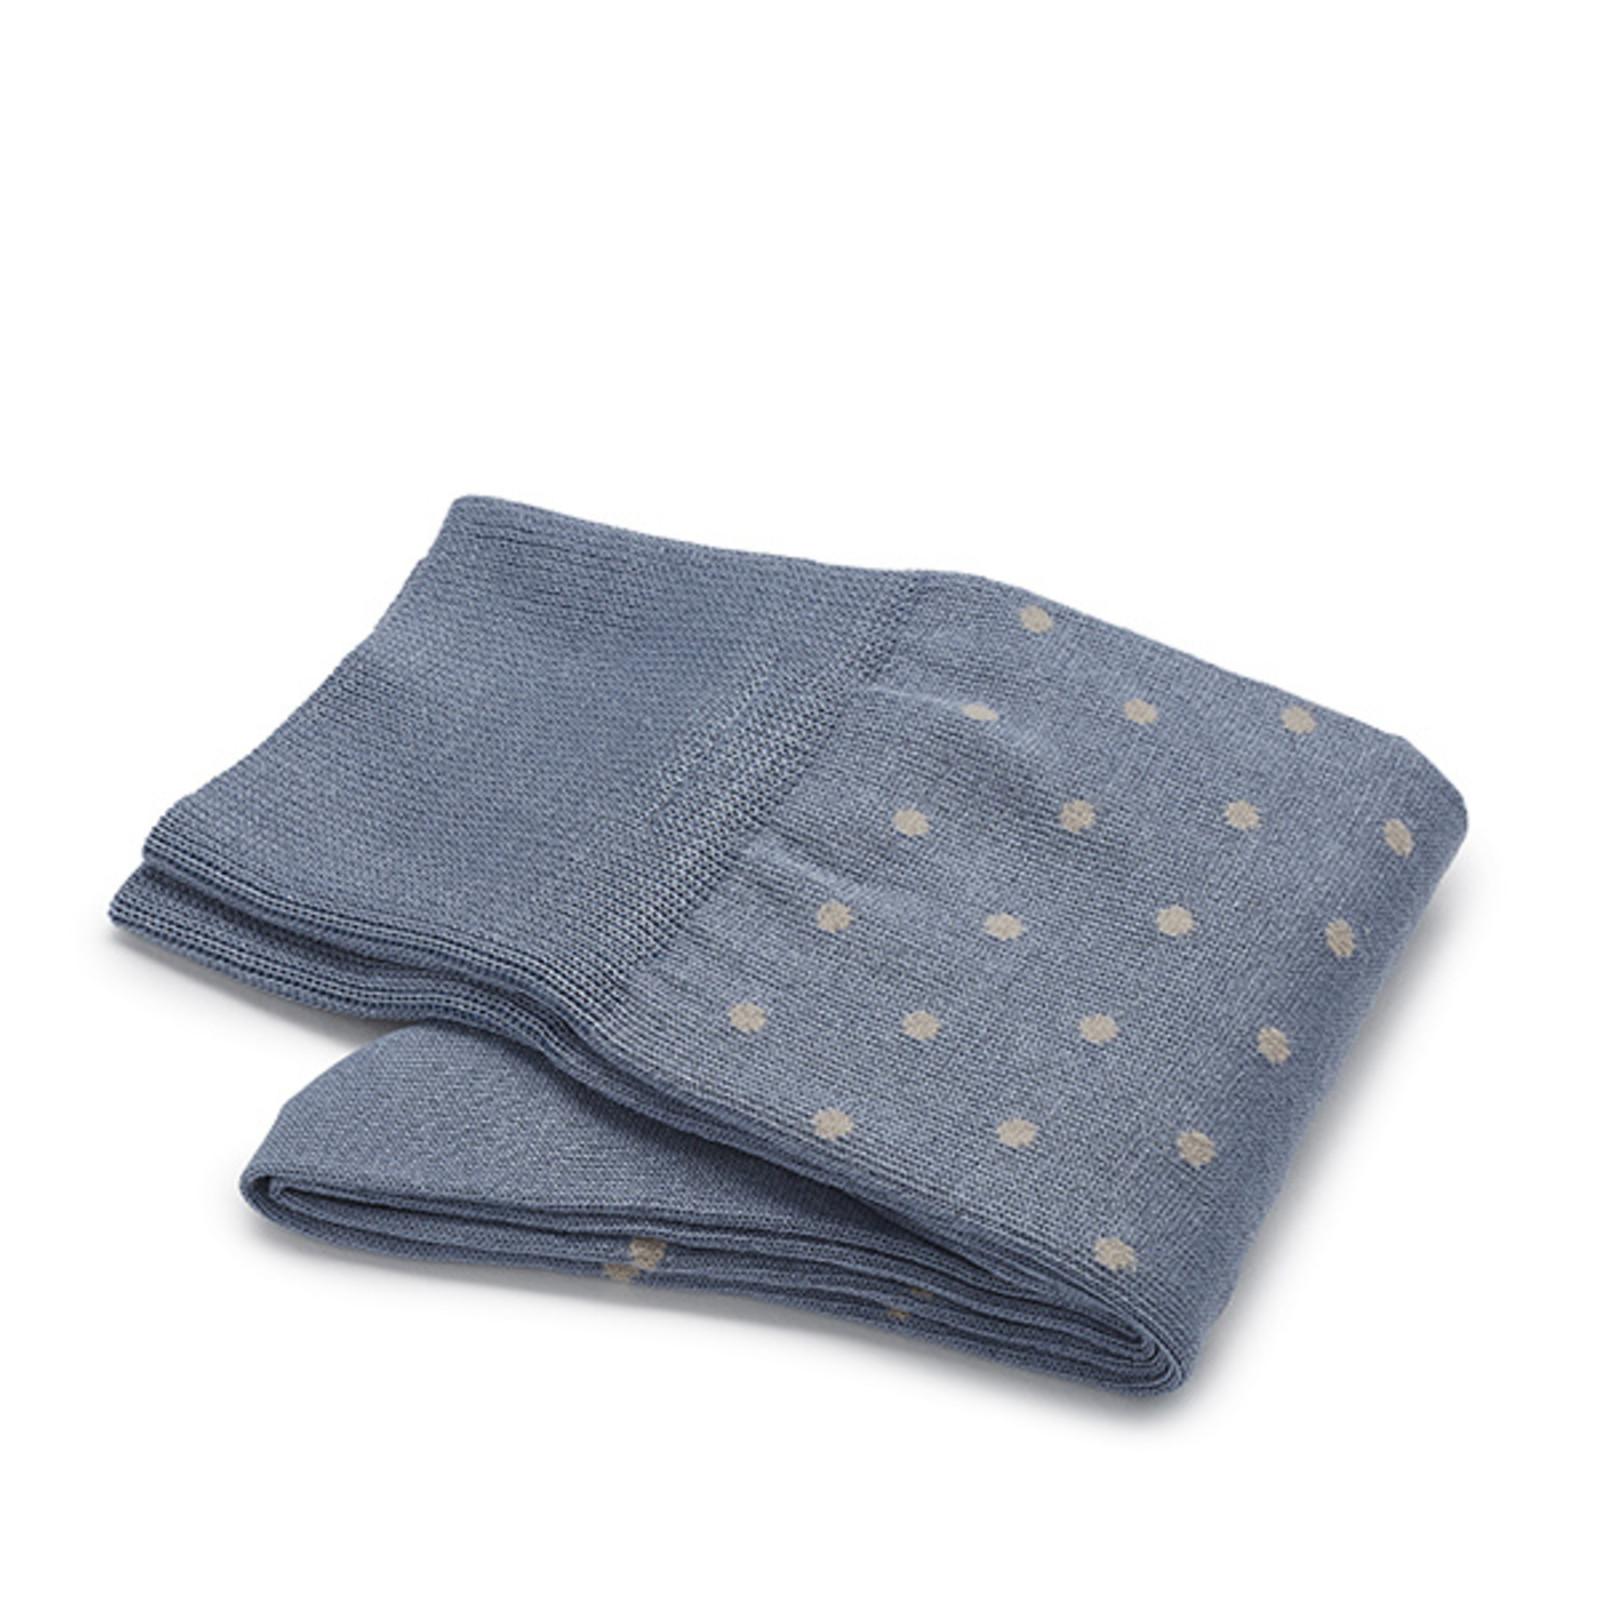 Carlo Lanza Blue socks dot